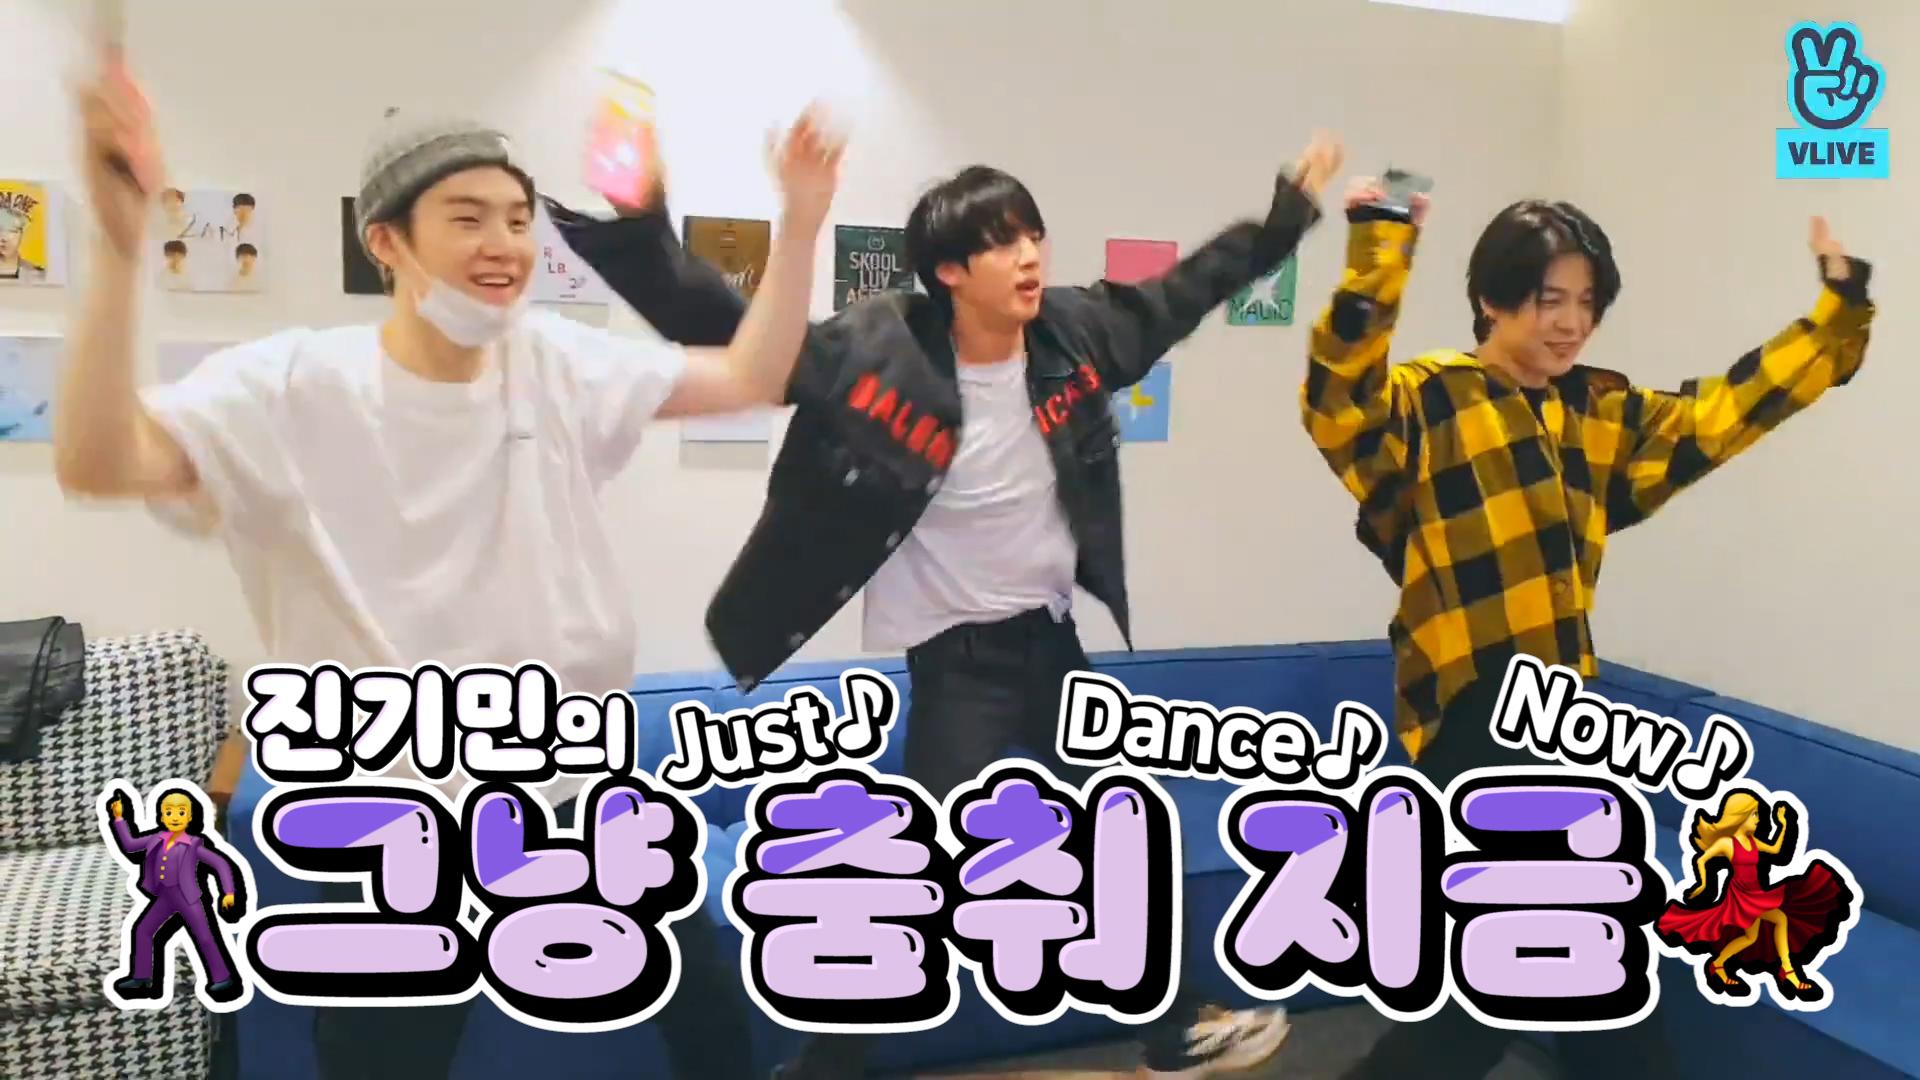 [BTS] 🕺진기민 충격적인 깜찍함에 내 심장 저스트 가루박살 나우💃 (BTS playing dance game)